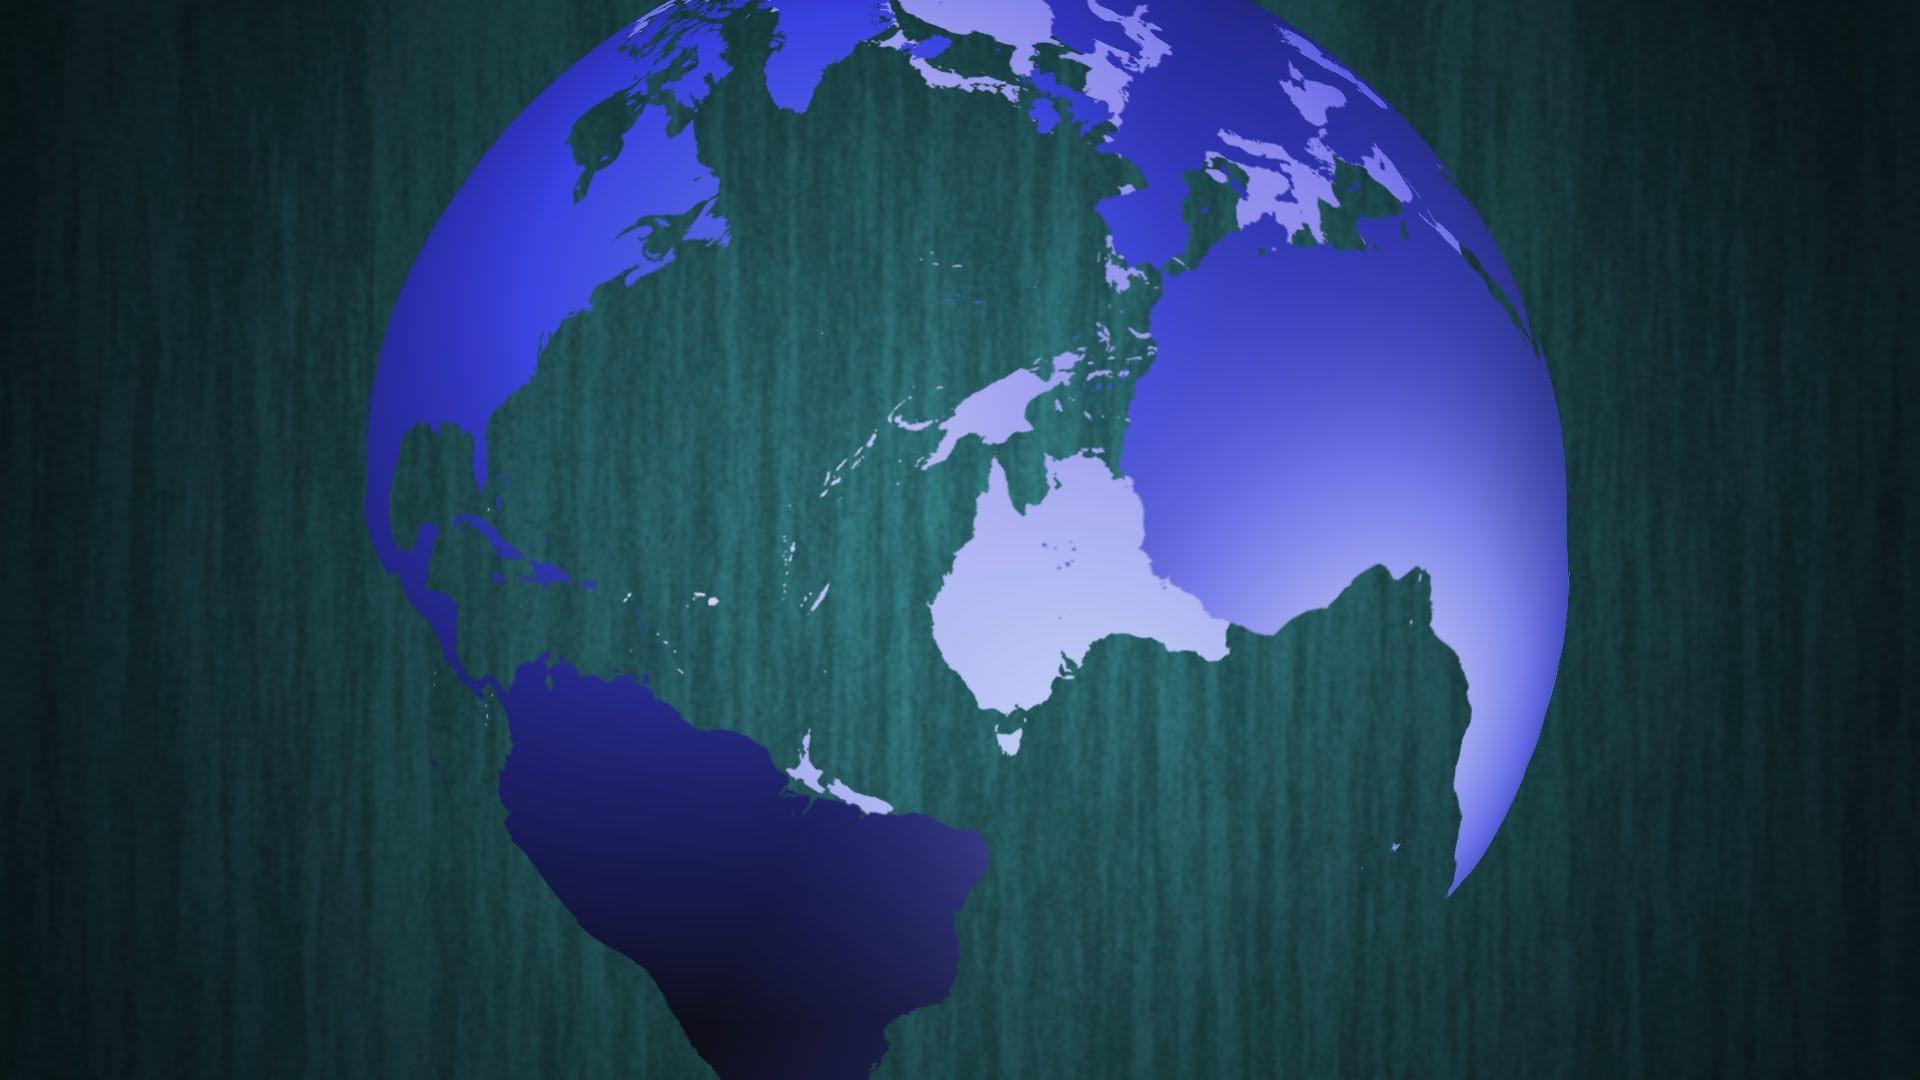 49 ] Spinning Globe Wallpaper On WallpaperSafari